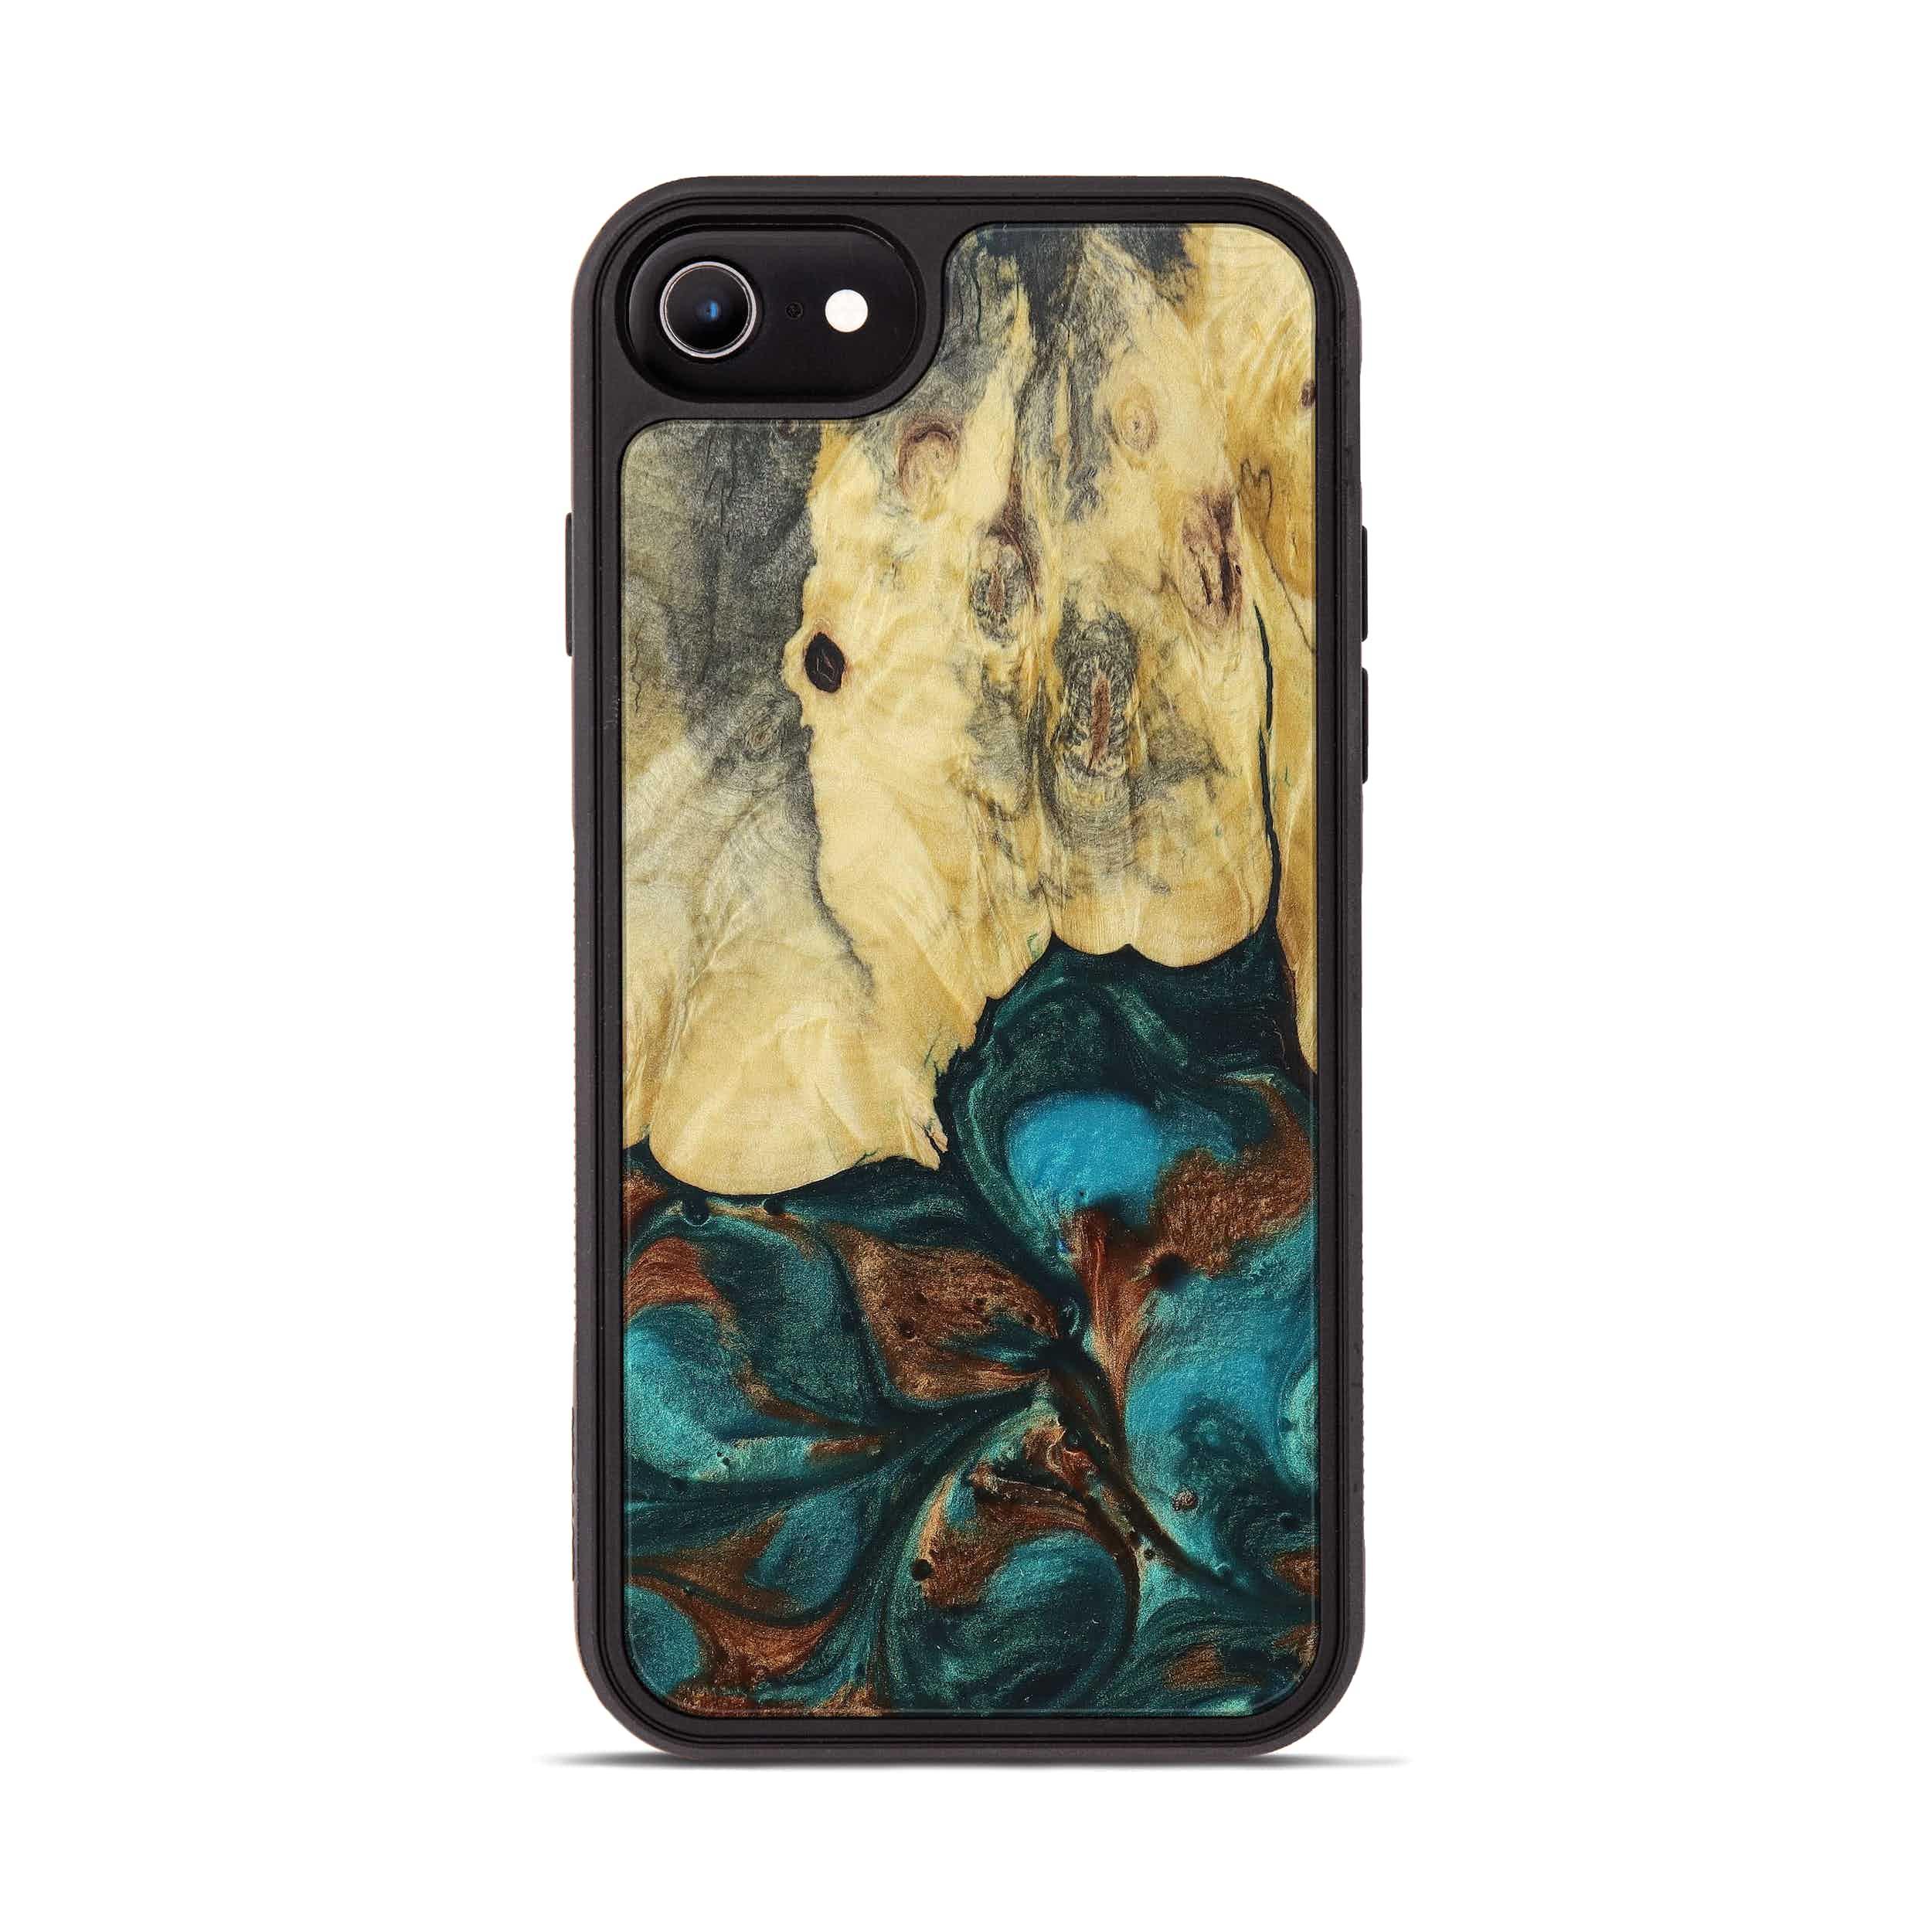 iPhone 8 Wood+Resin Phone Case - Karyl (Teal & Gold, 394387)